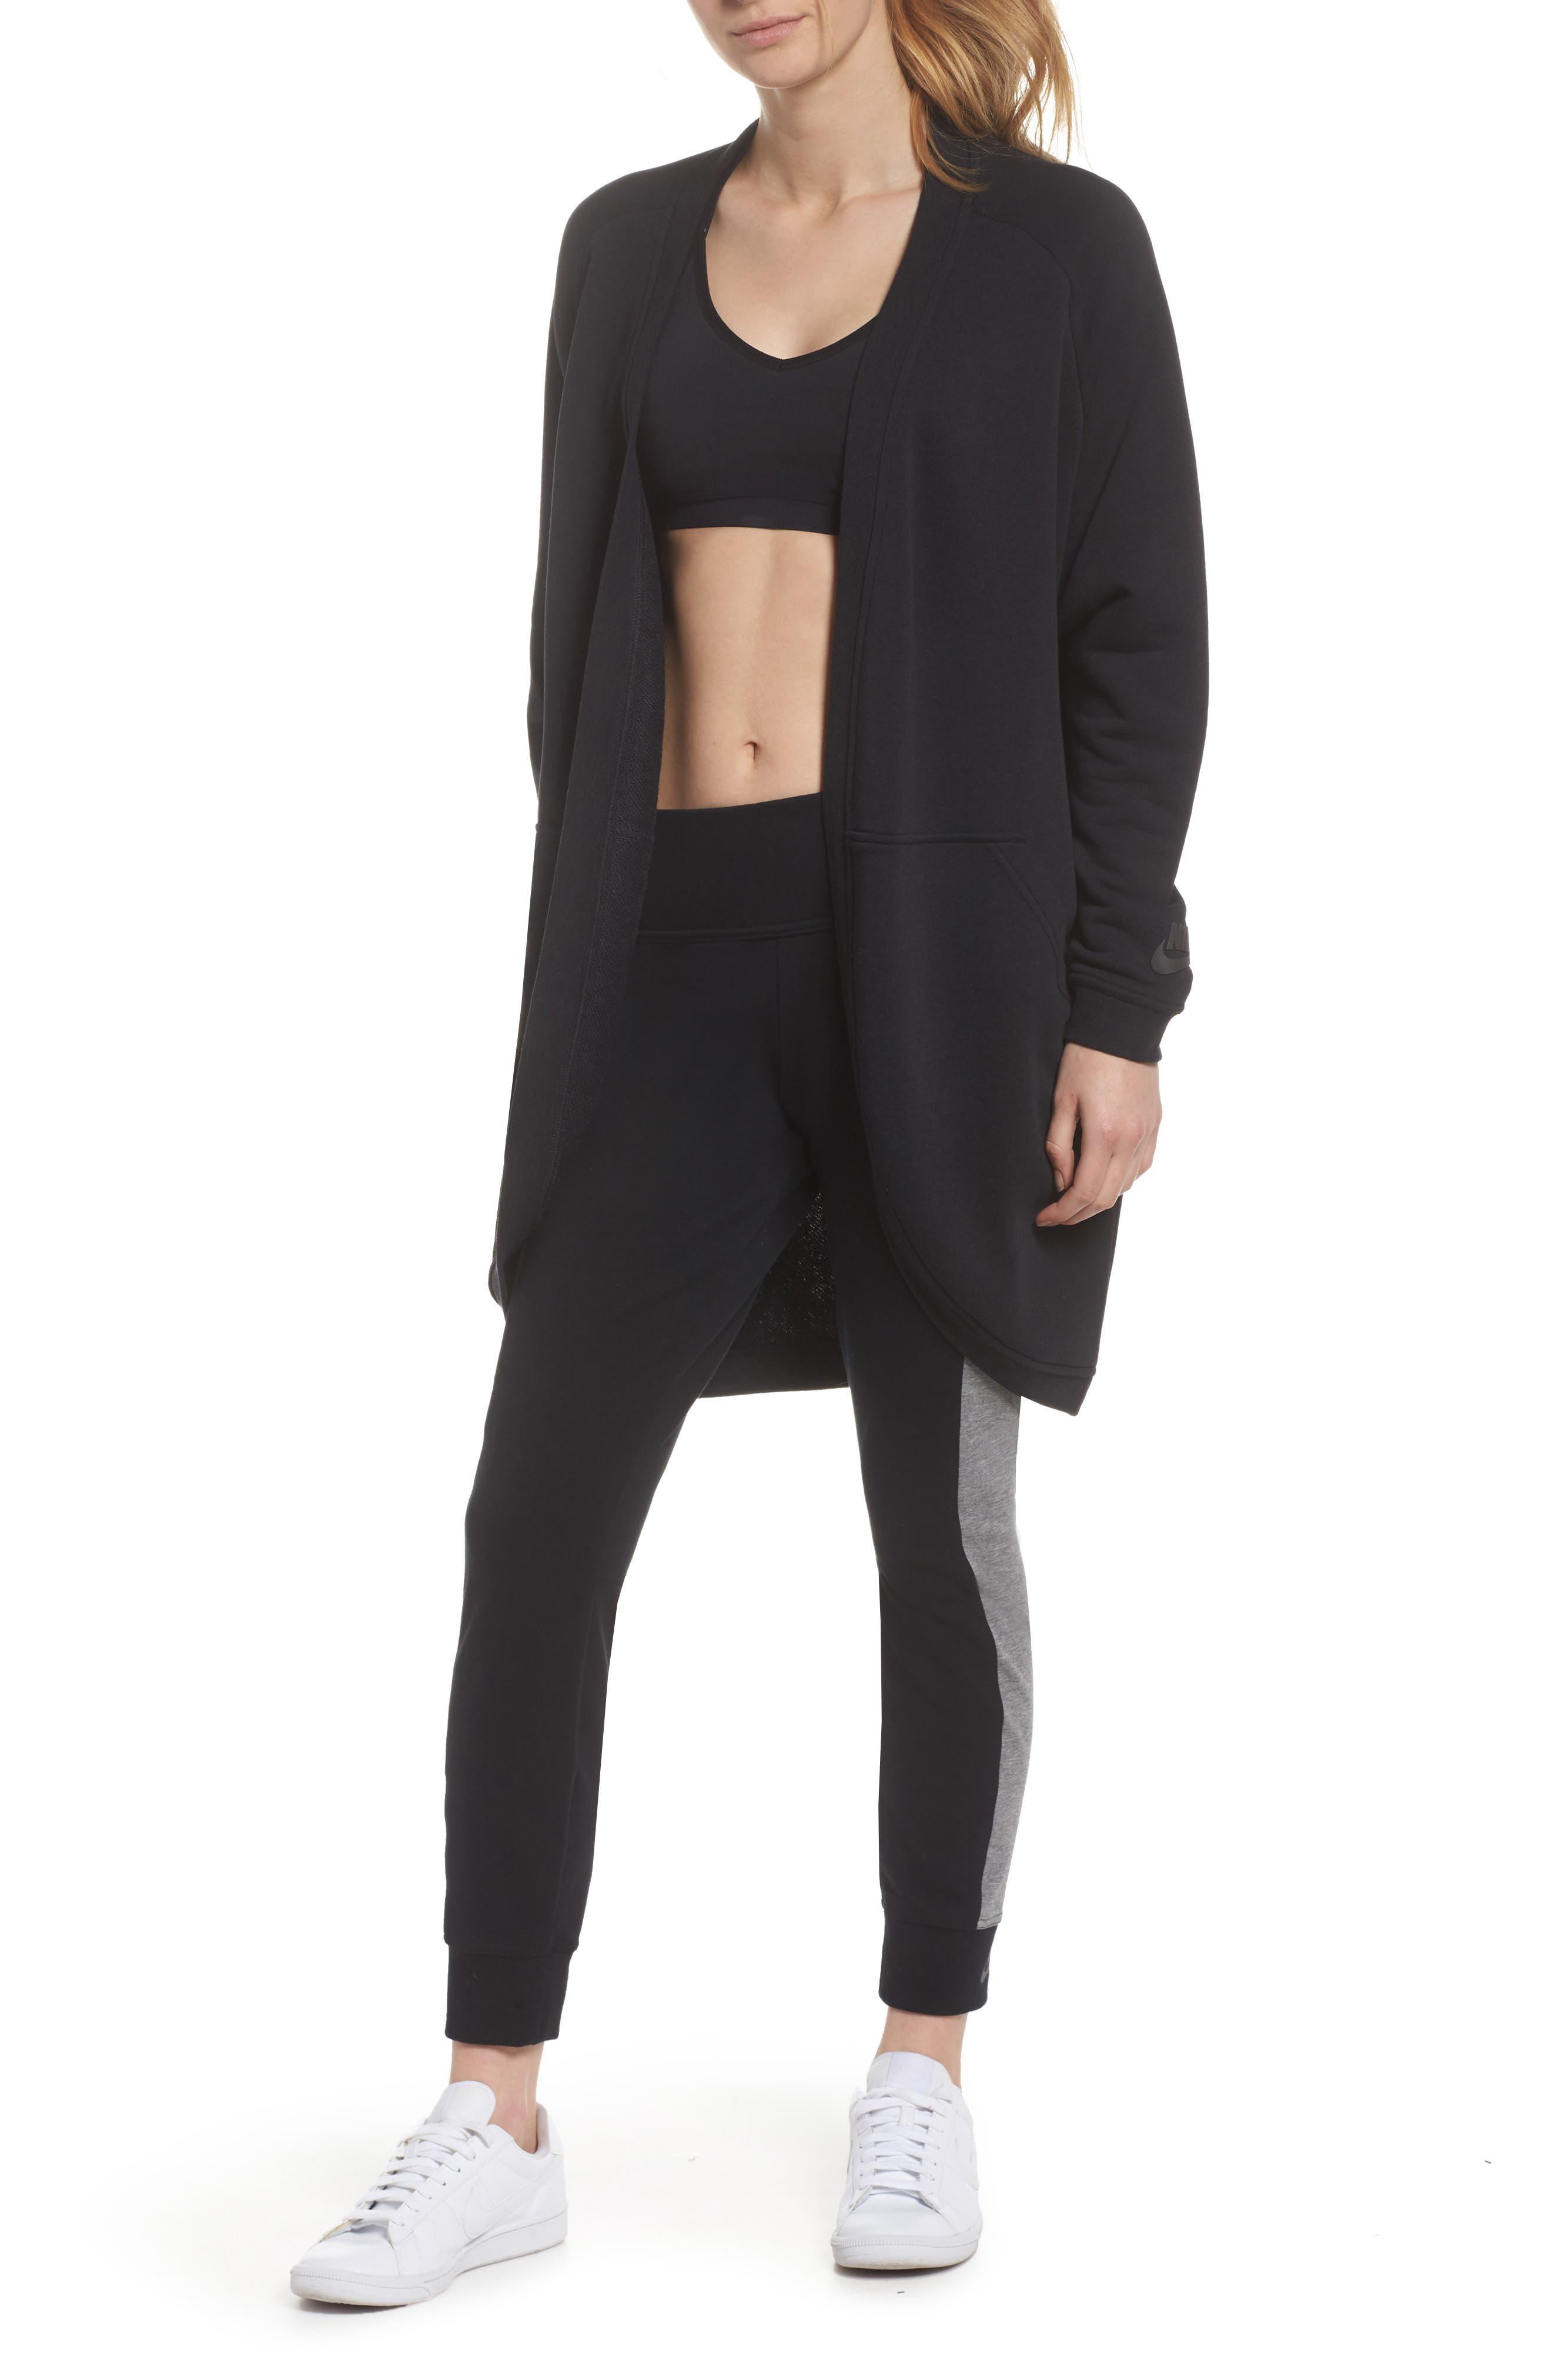 Sportswear Modern Cardigan,                         Main,                         color, Black